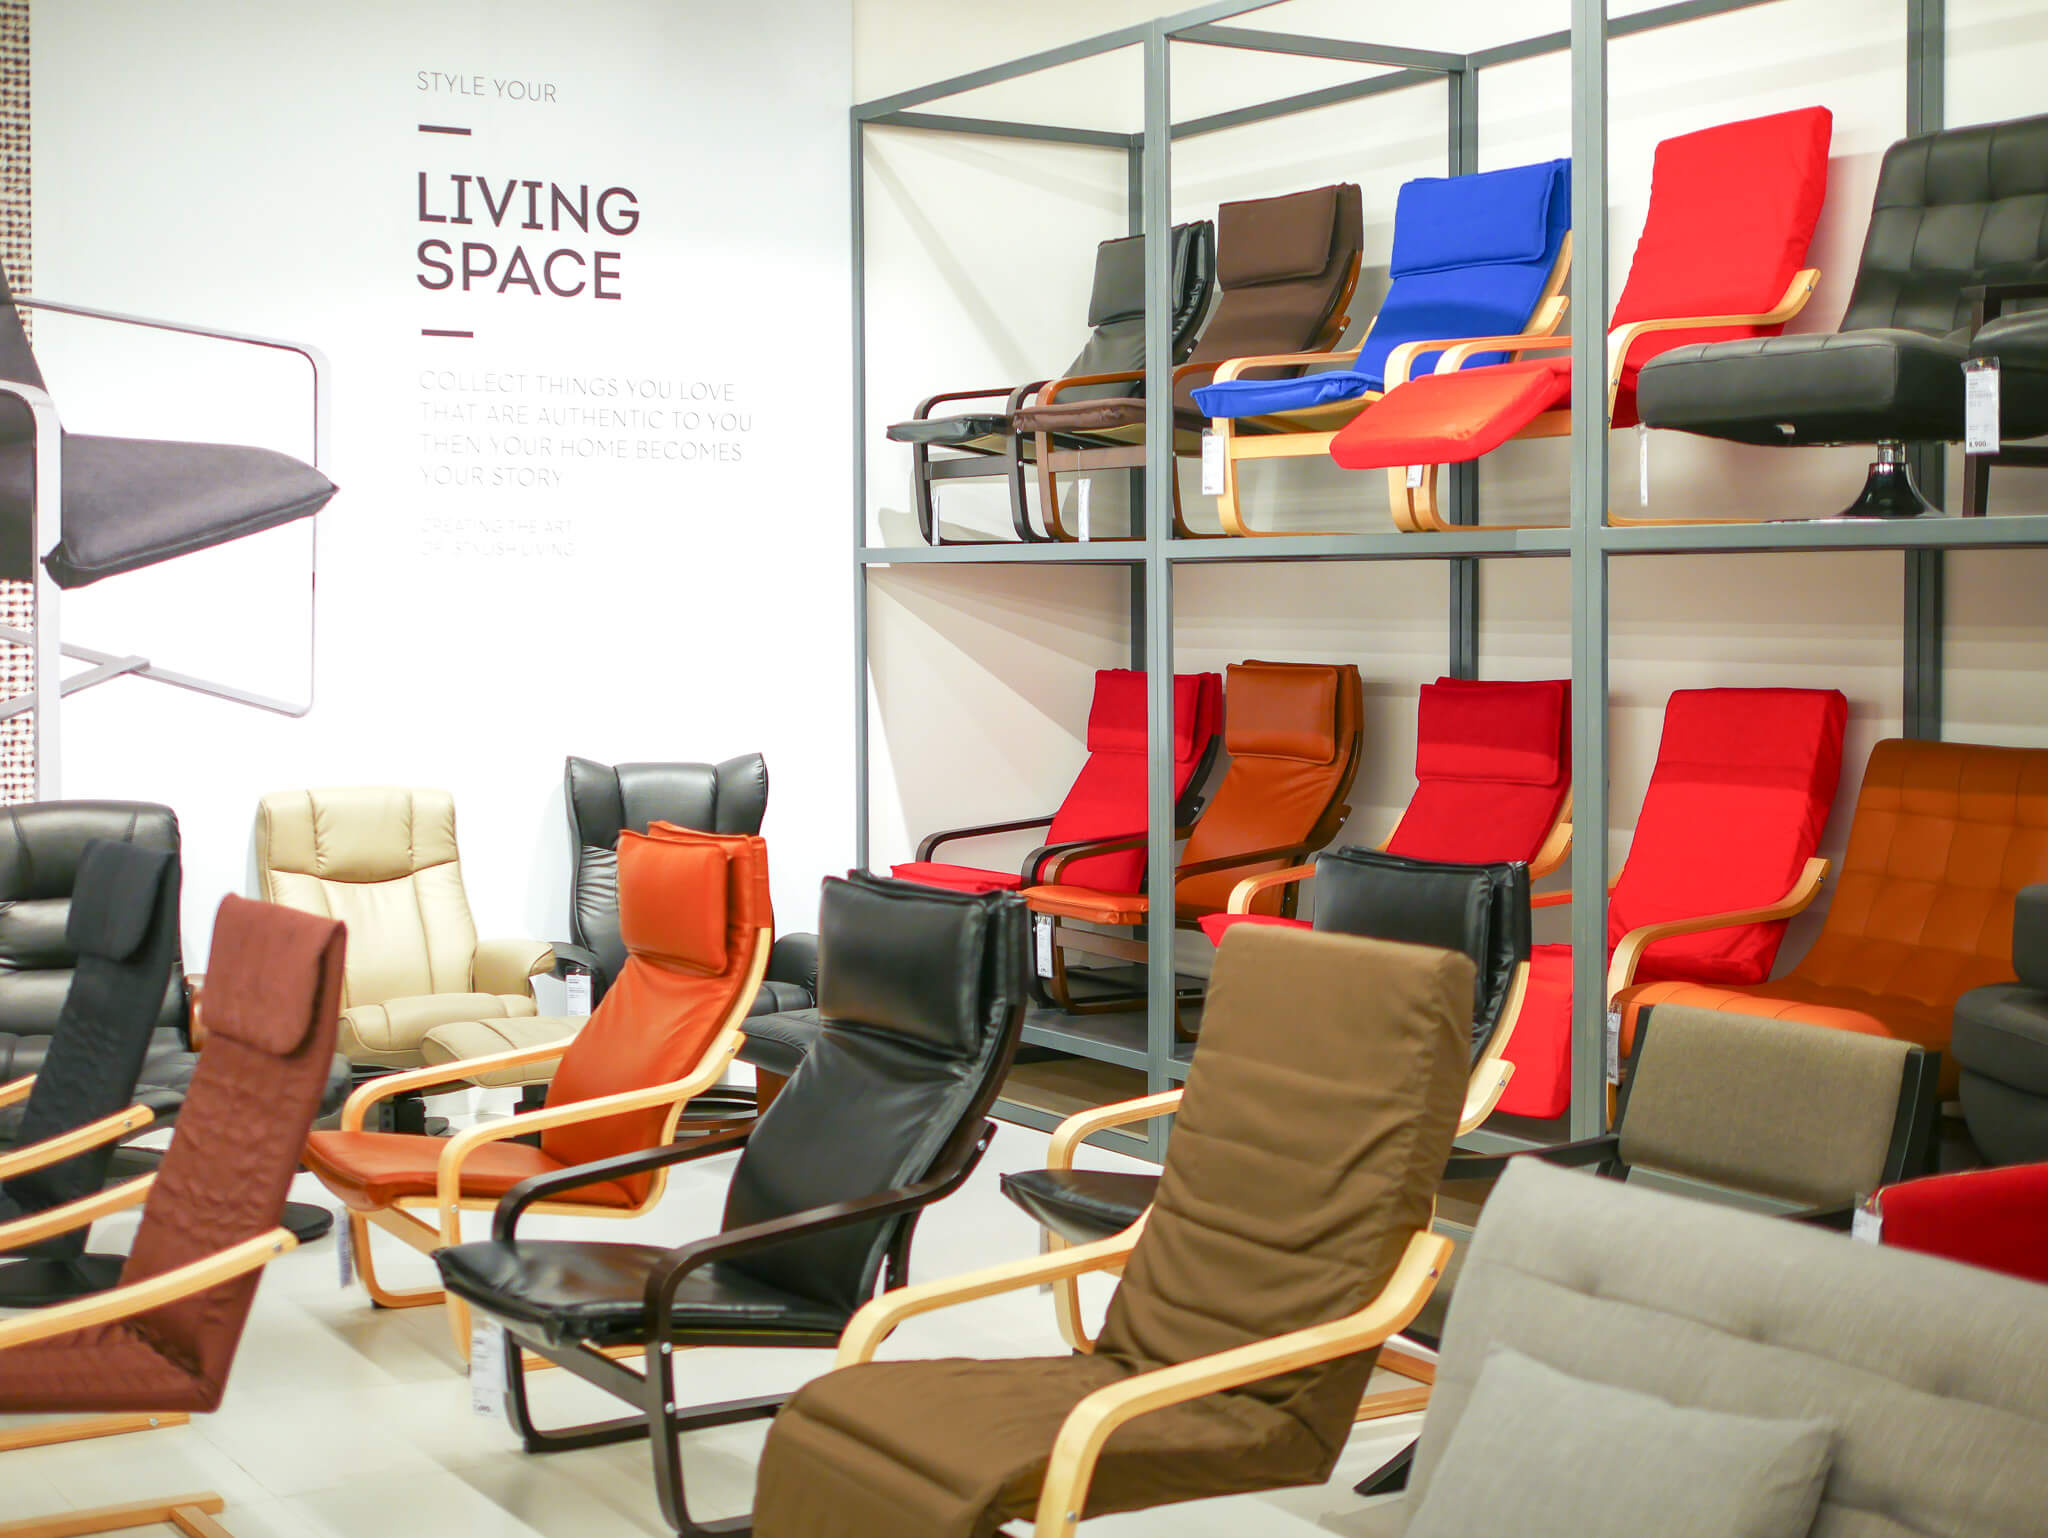 "Index Living Mall พระราม 2 เปิดใหม่ไม่ใช่แค่ ""ร้านเฟอร์นิเจอร์"" แต่เป็น ""Lifestyle Destination"" แนว URBAN STYLISH 68 - Index Living Mall (อินเด็กซ์ ลิฟวิ่งมอลล์)"